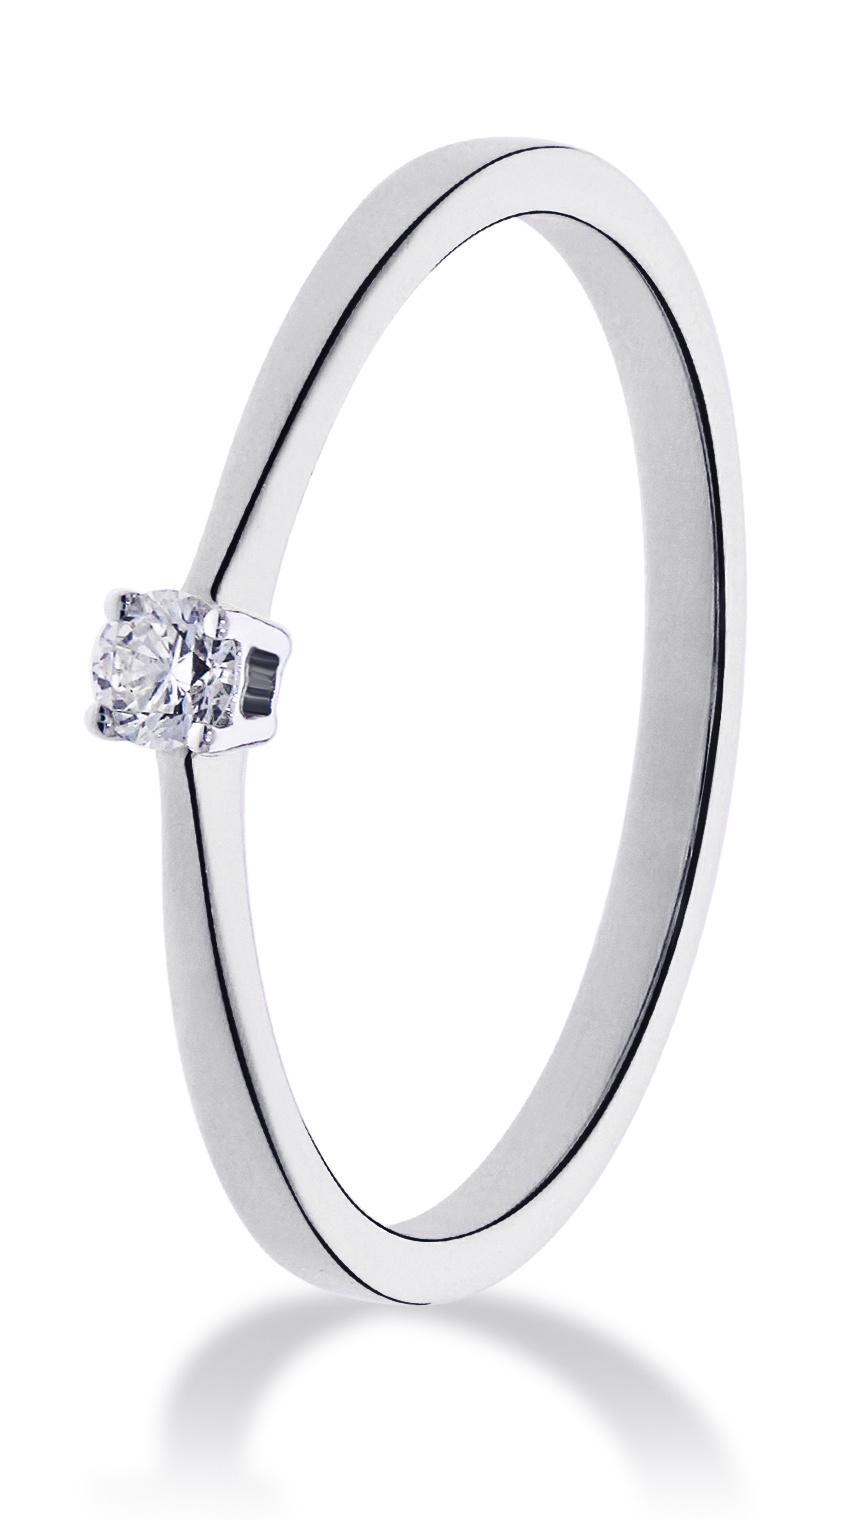 14 karaat witgouden ring met diamant 0.10 crt. - Solitair - Witgoud-1